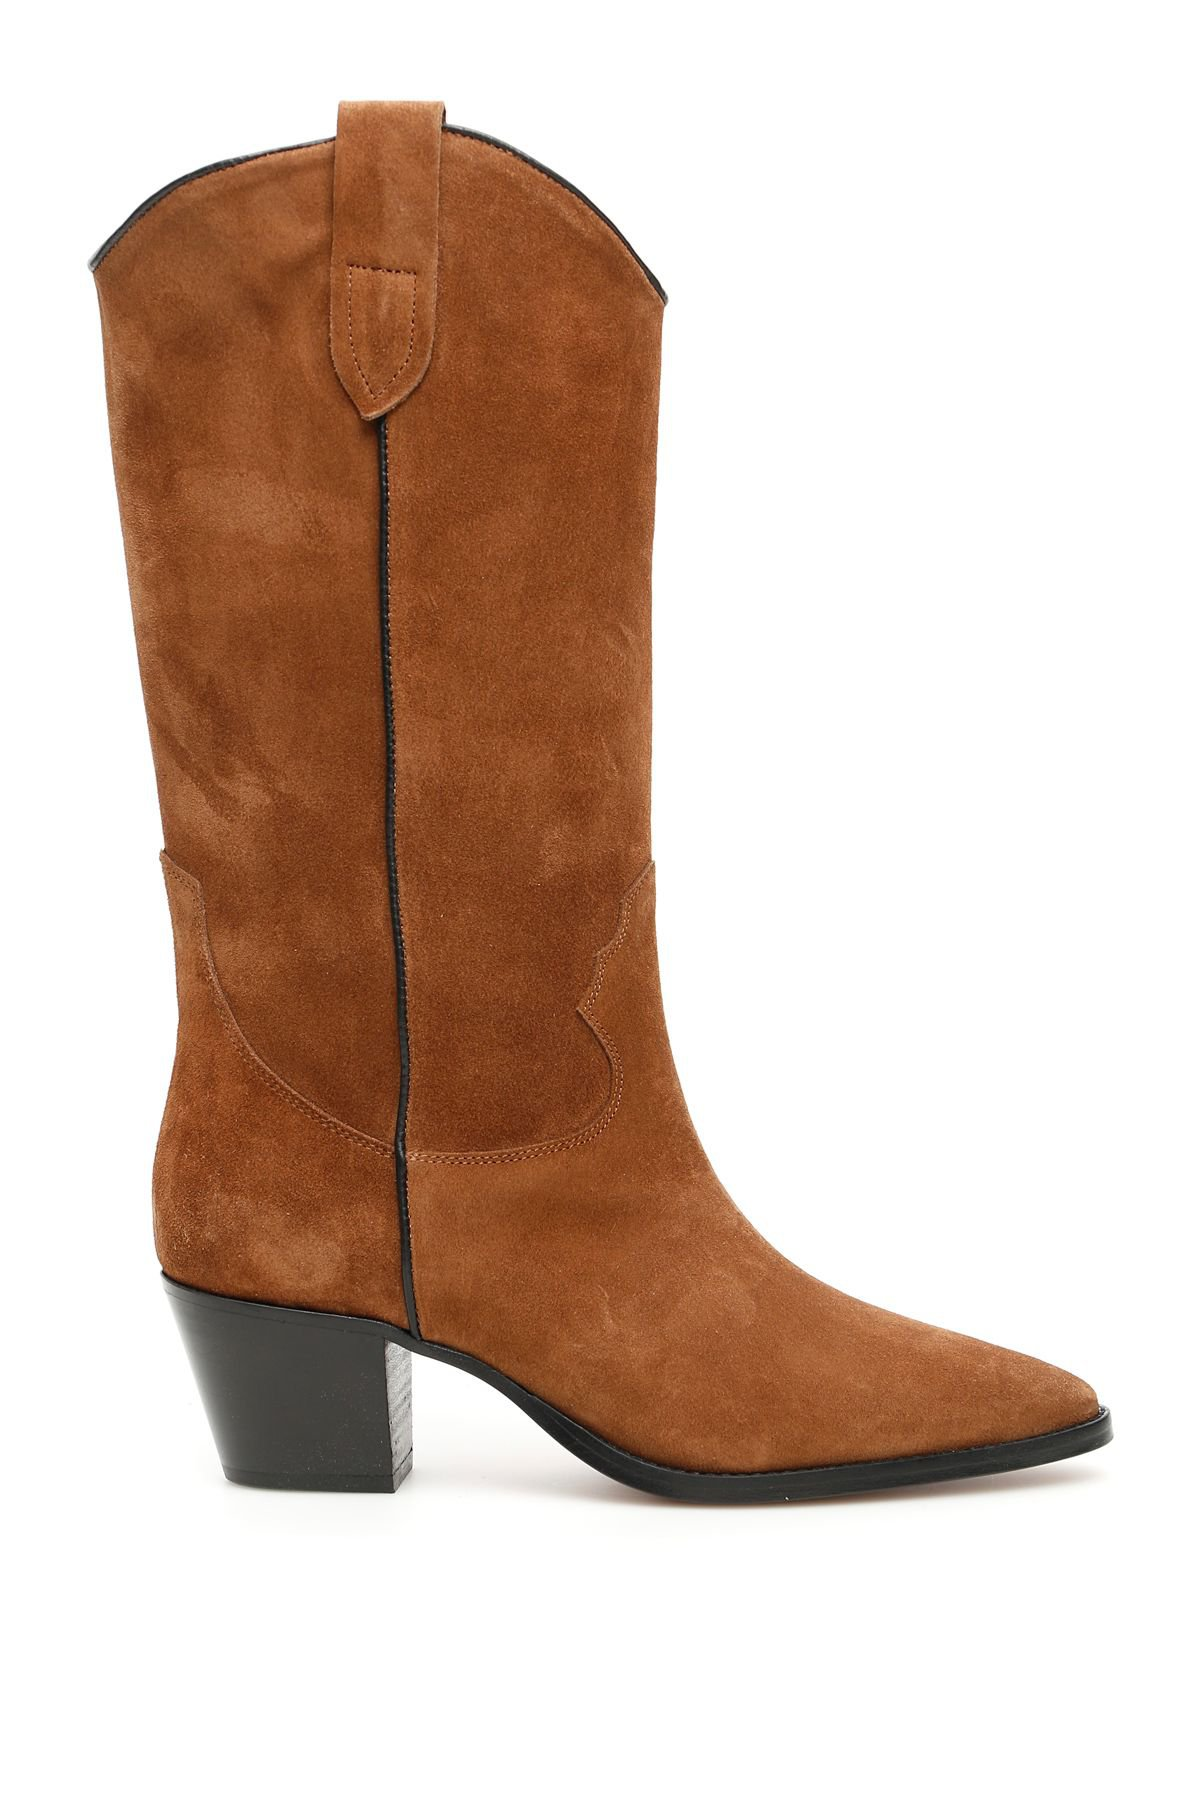 Paris Texas Western Boots